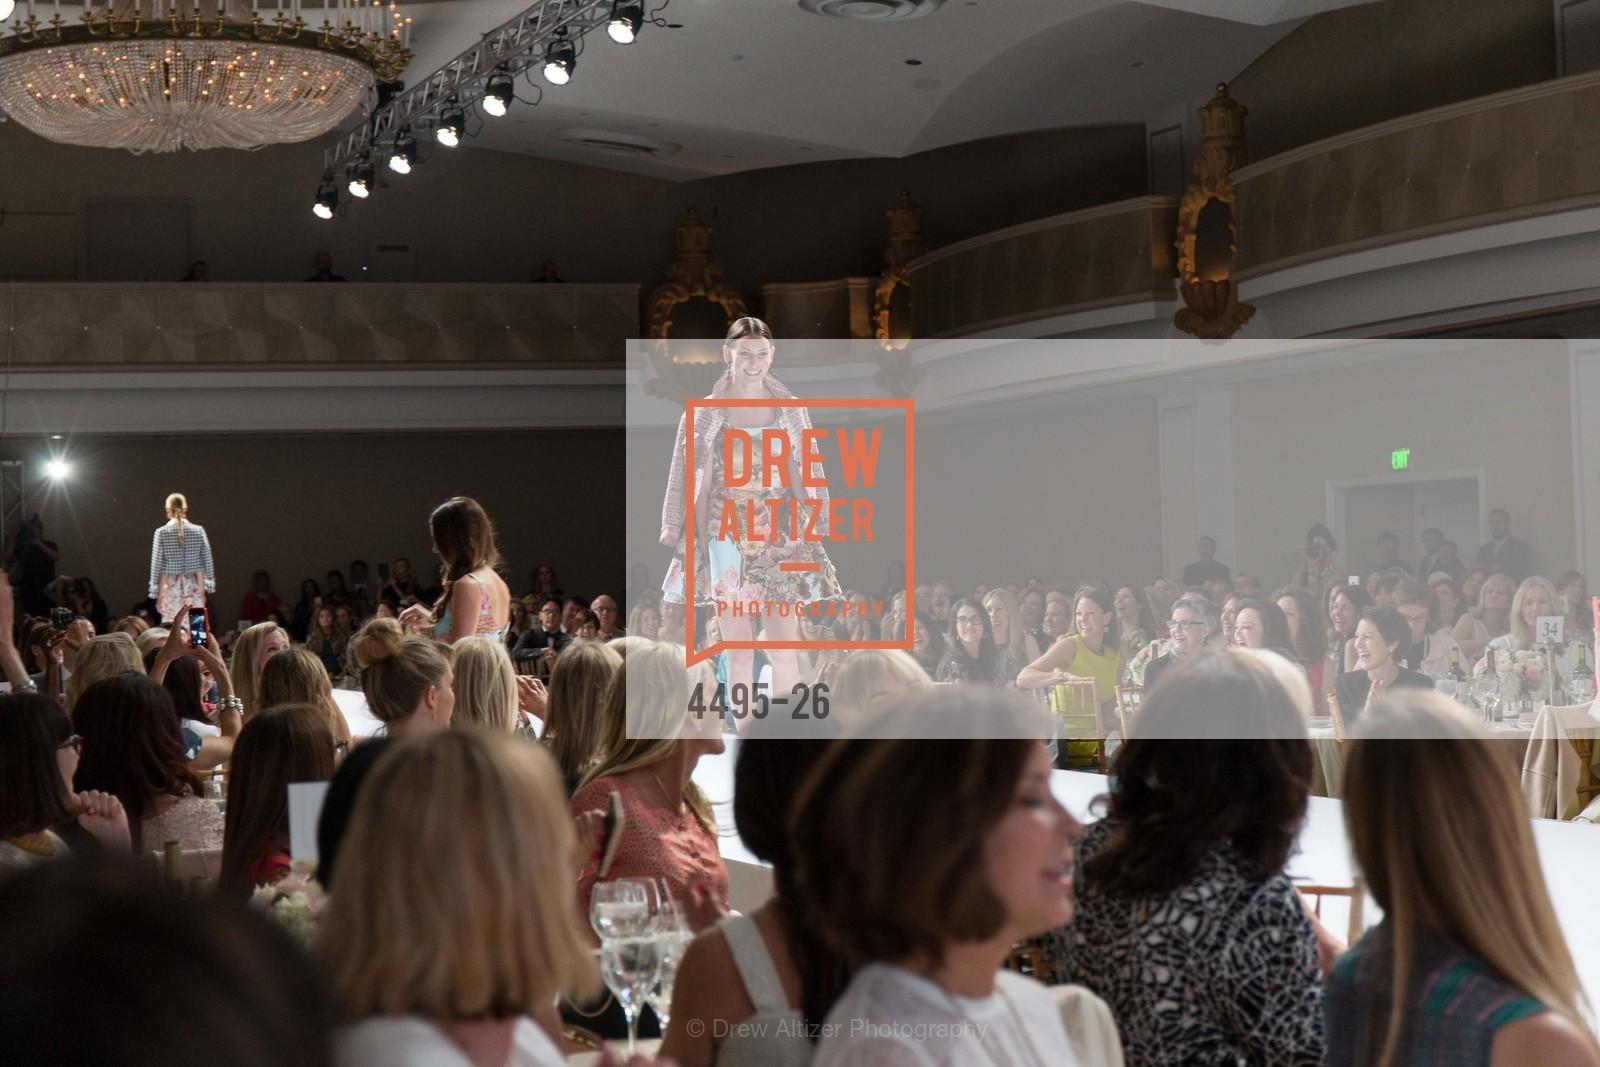 Top Picks, Neiman Marcus Presents the 2015 San Francisco Ballet Fashion Show, April 2nd, 2015, Photo,Drew Altizer, Drew Altizer Photography, full-service event agency, private events, San Francisco photographer, photographer California